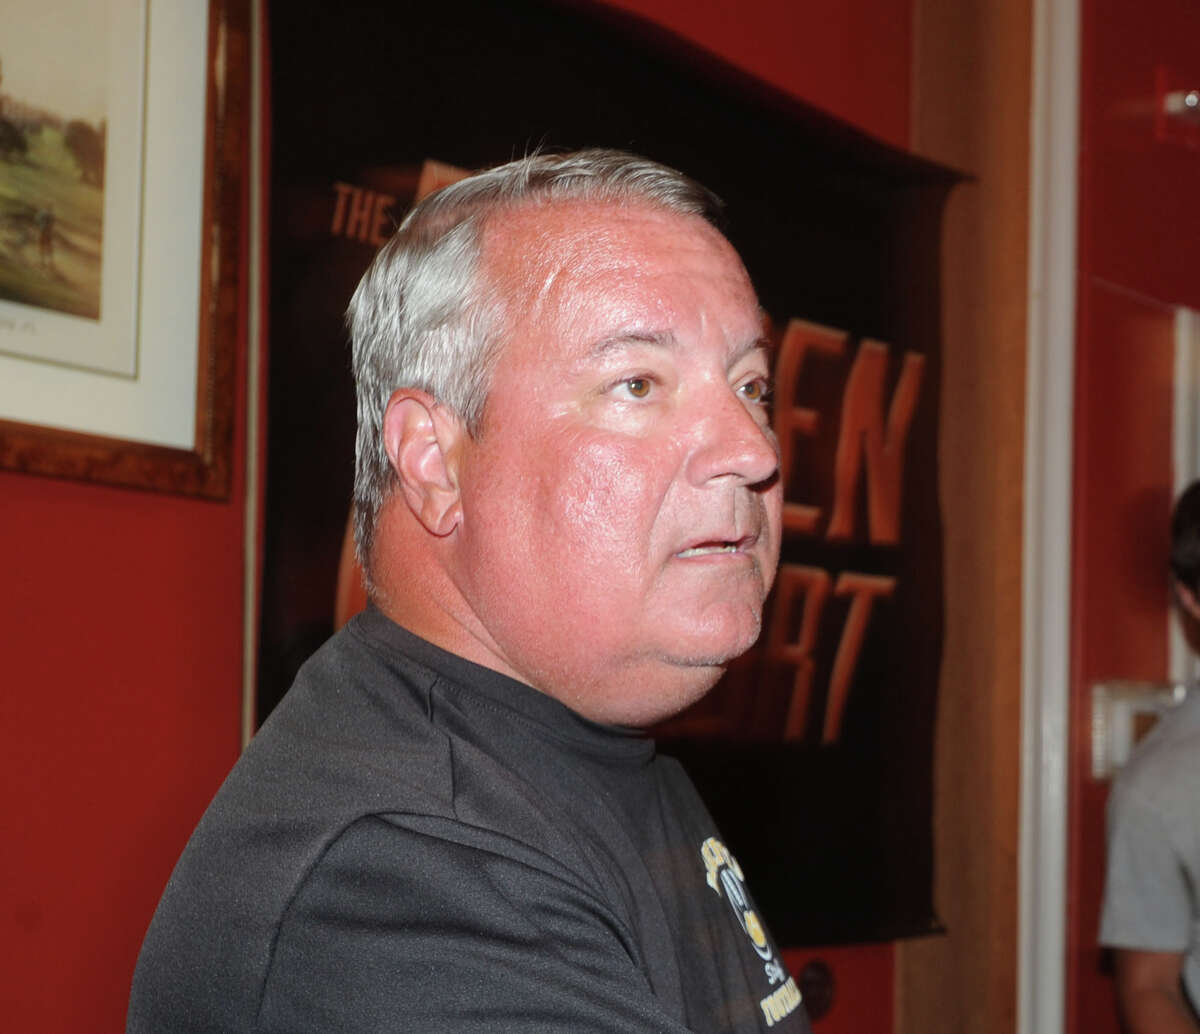 Ridgefield High School head football coach Kevin Callahan during FCIAC Football Media Night at Zody's 19th Hole Restaurant in Stamford, Conn., Tuesday, Sept. 2, 2014.